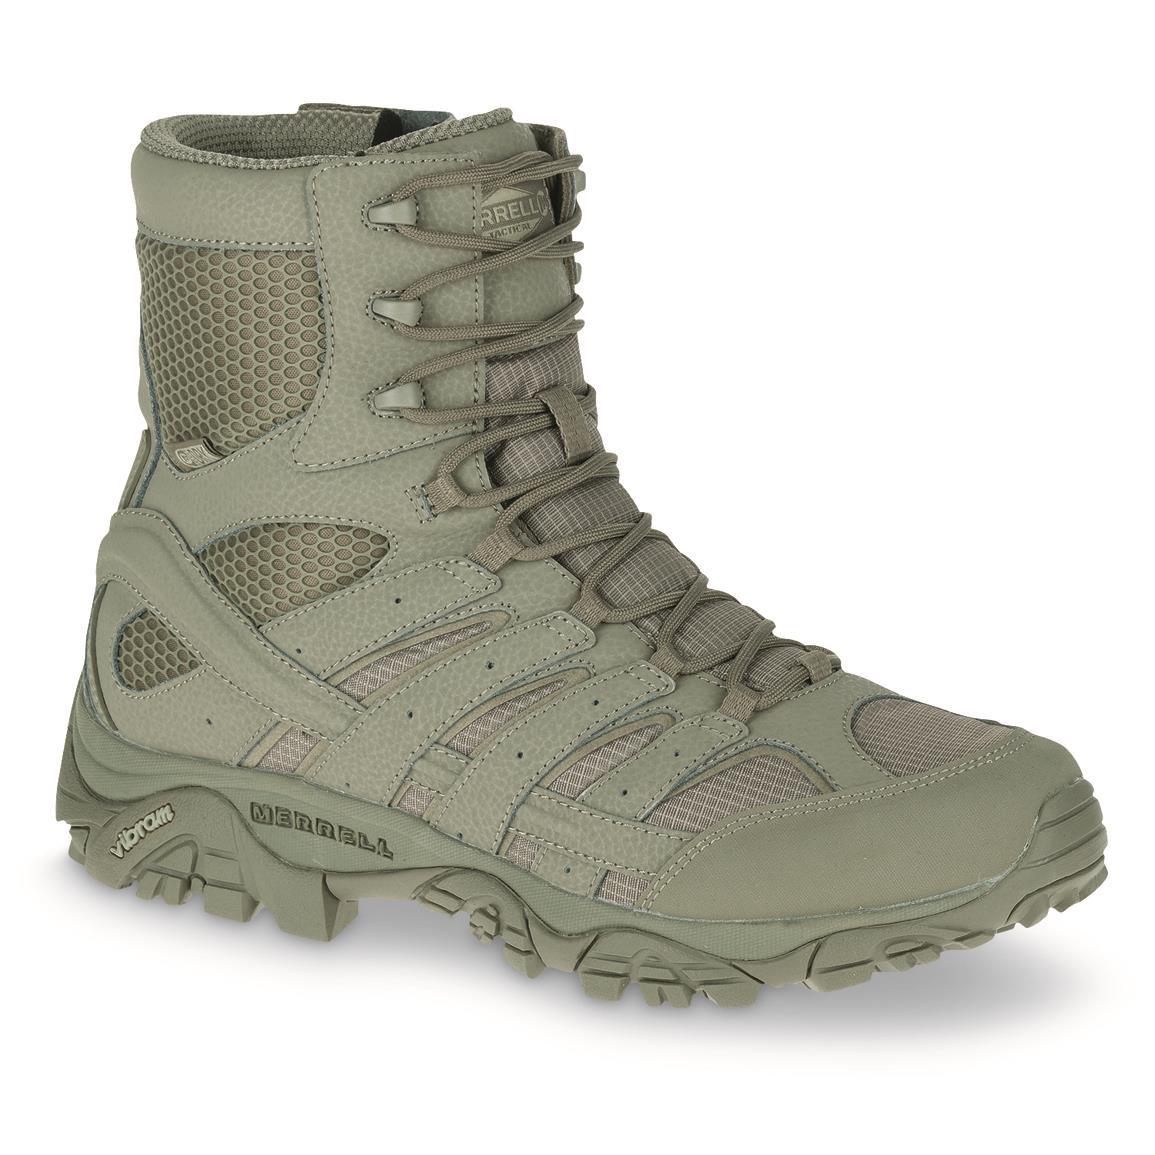 e9fe1cf5d9f Men's Moab 2 8in Tactical Waterproof Boot